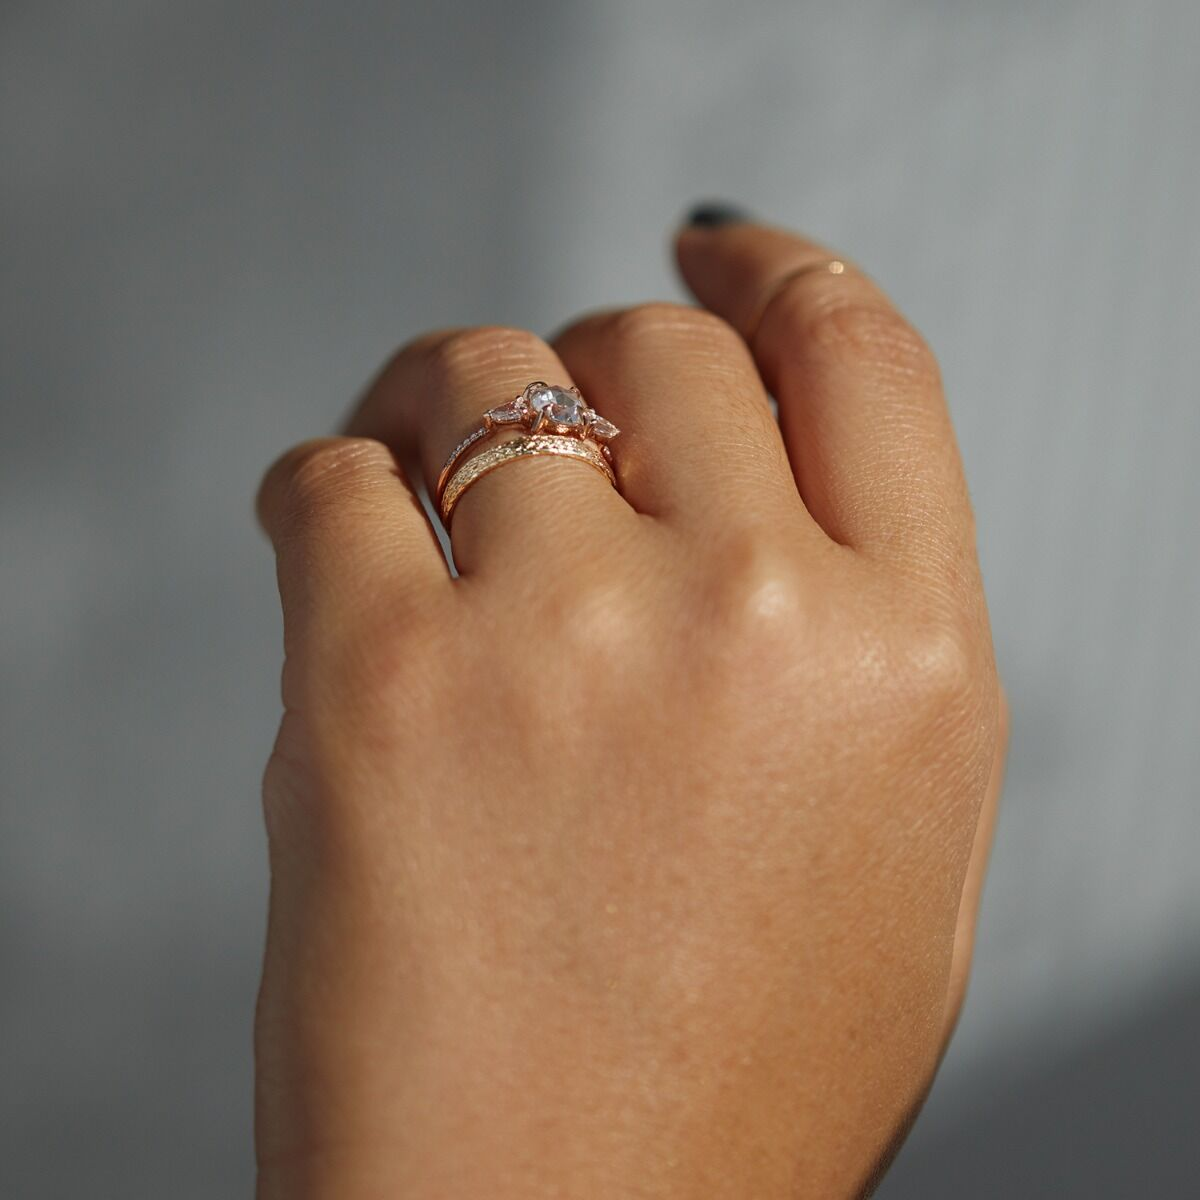 Passement Ring image